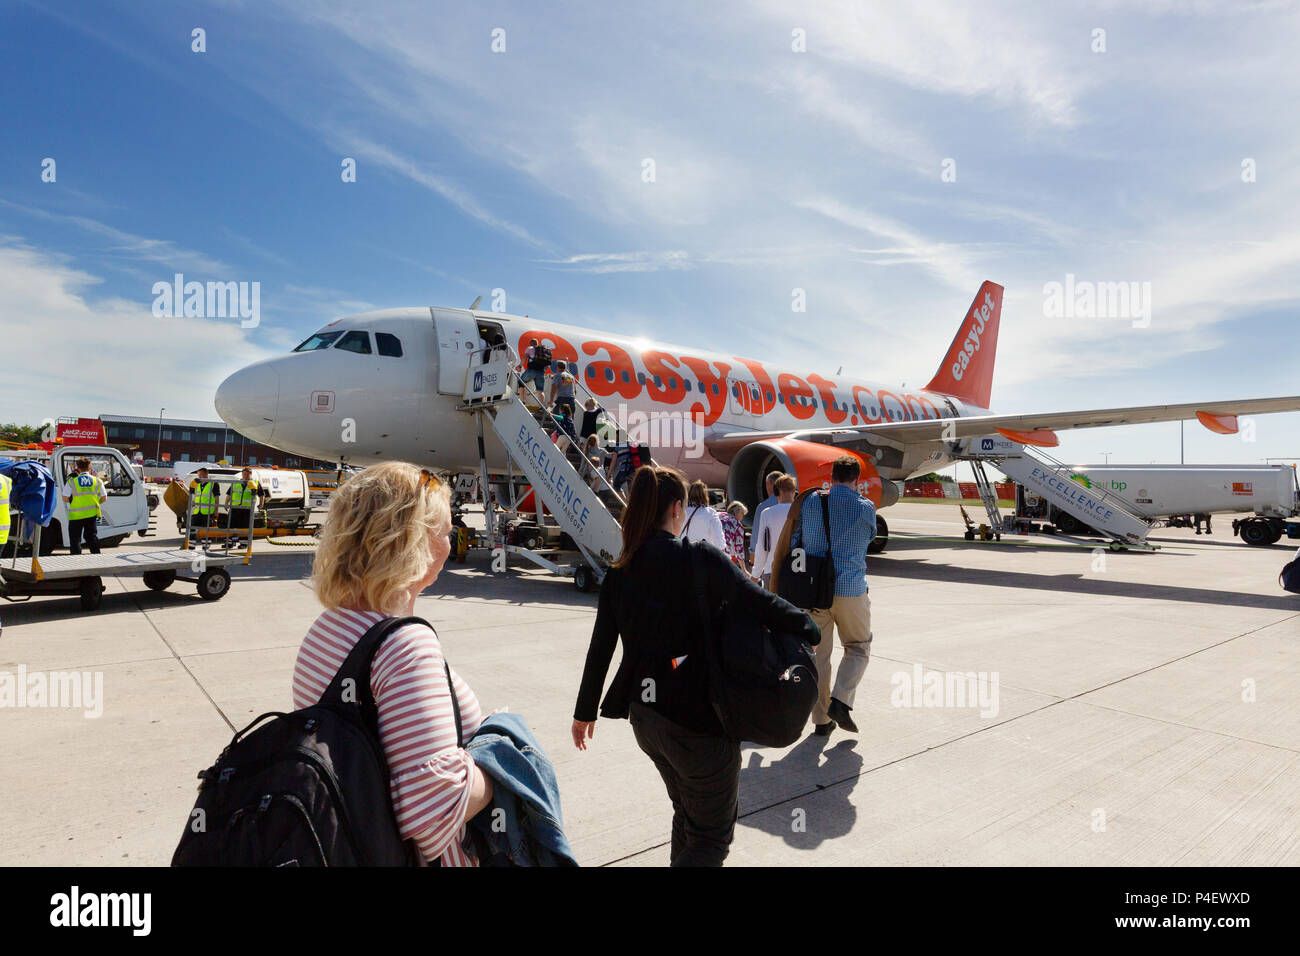 Air passengers boarding an Easyjet plane at Edinburgh Airport, Edinburgh Scotland UK Stock Photo